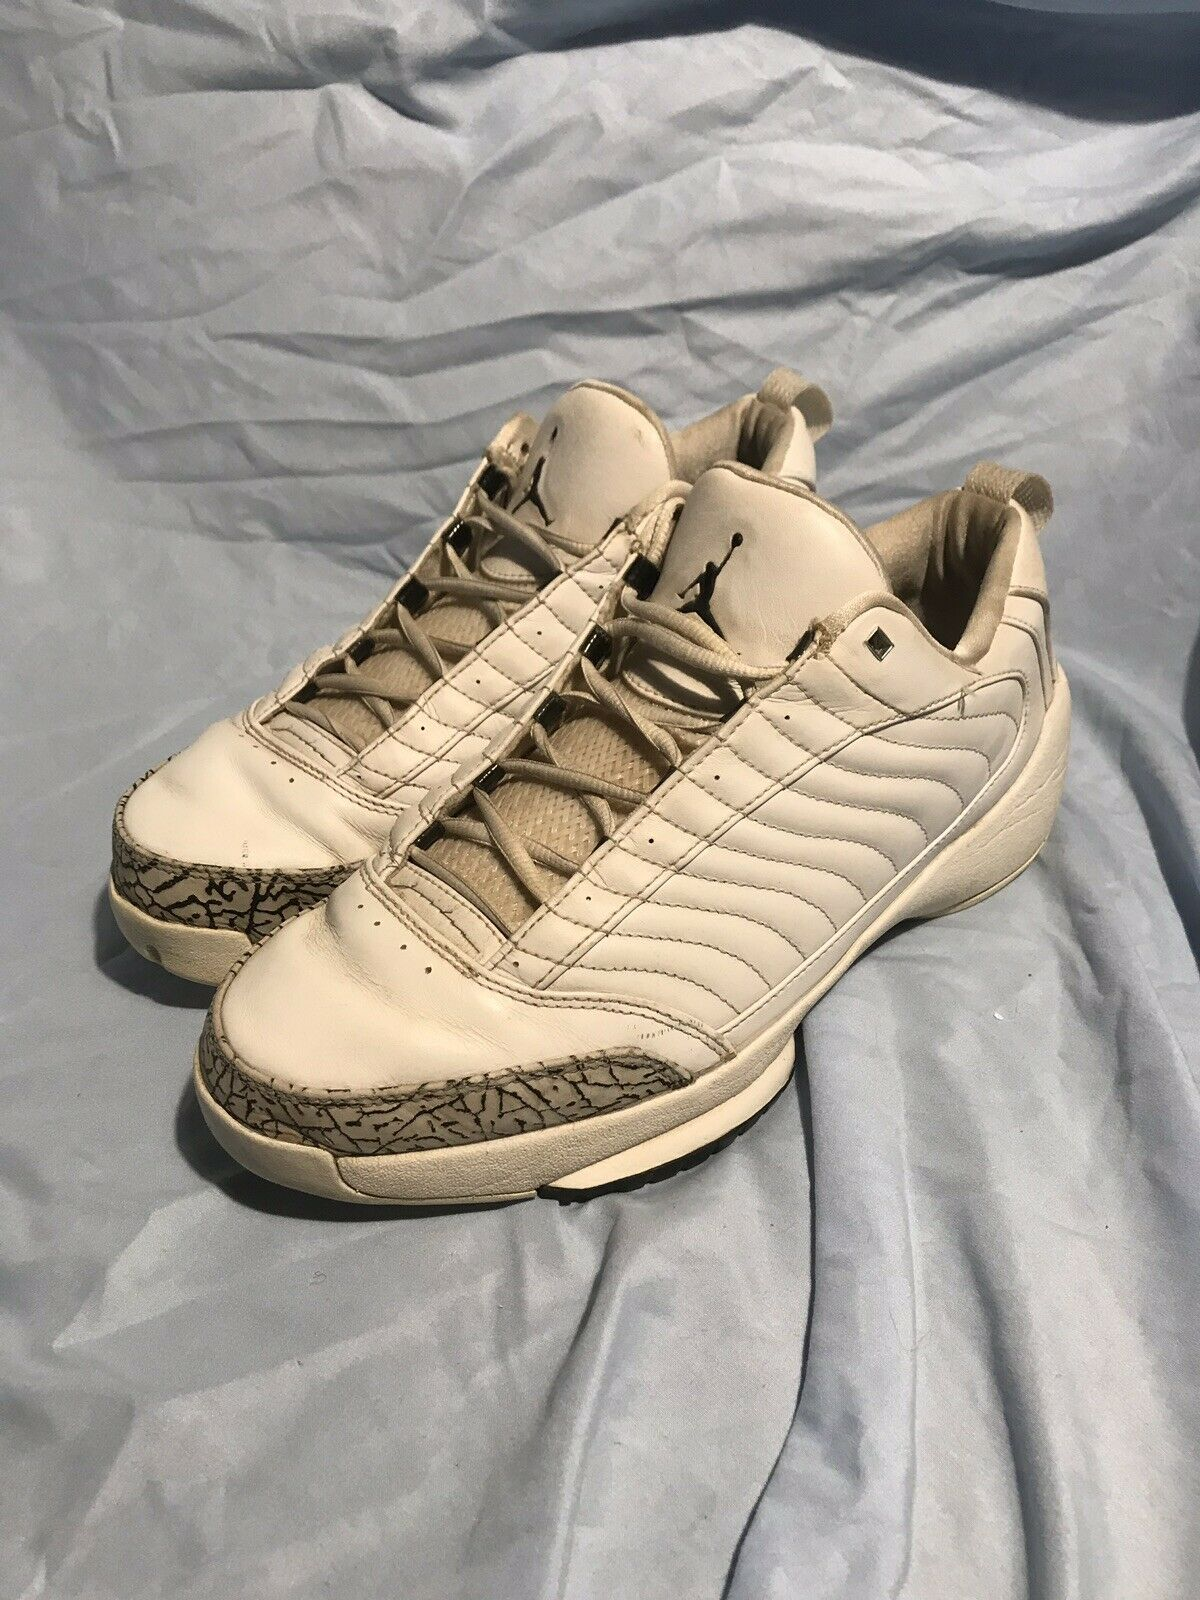 2004 19s Lows Size 12 Nike, Air Jordan, Retro, OG,Vintage White Grey Cement